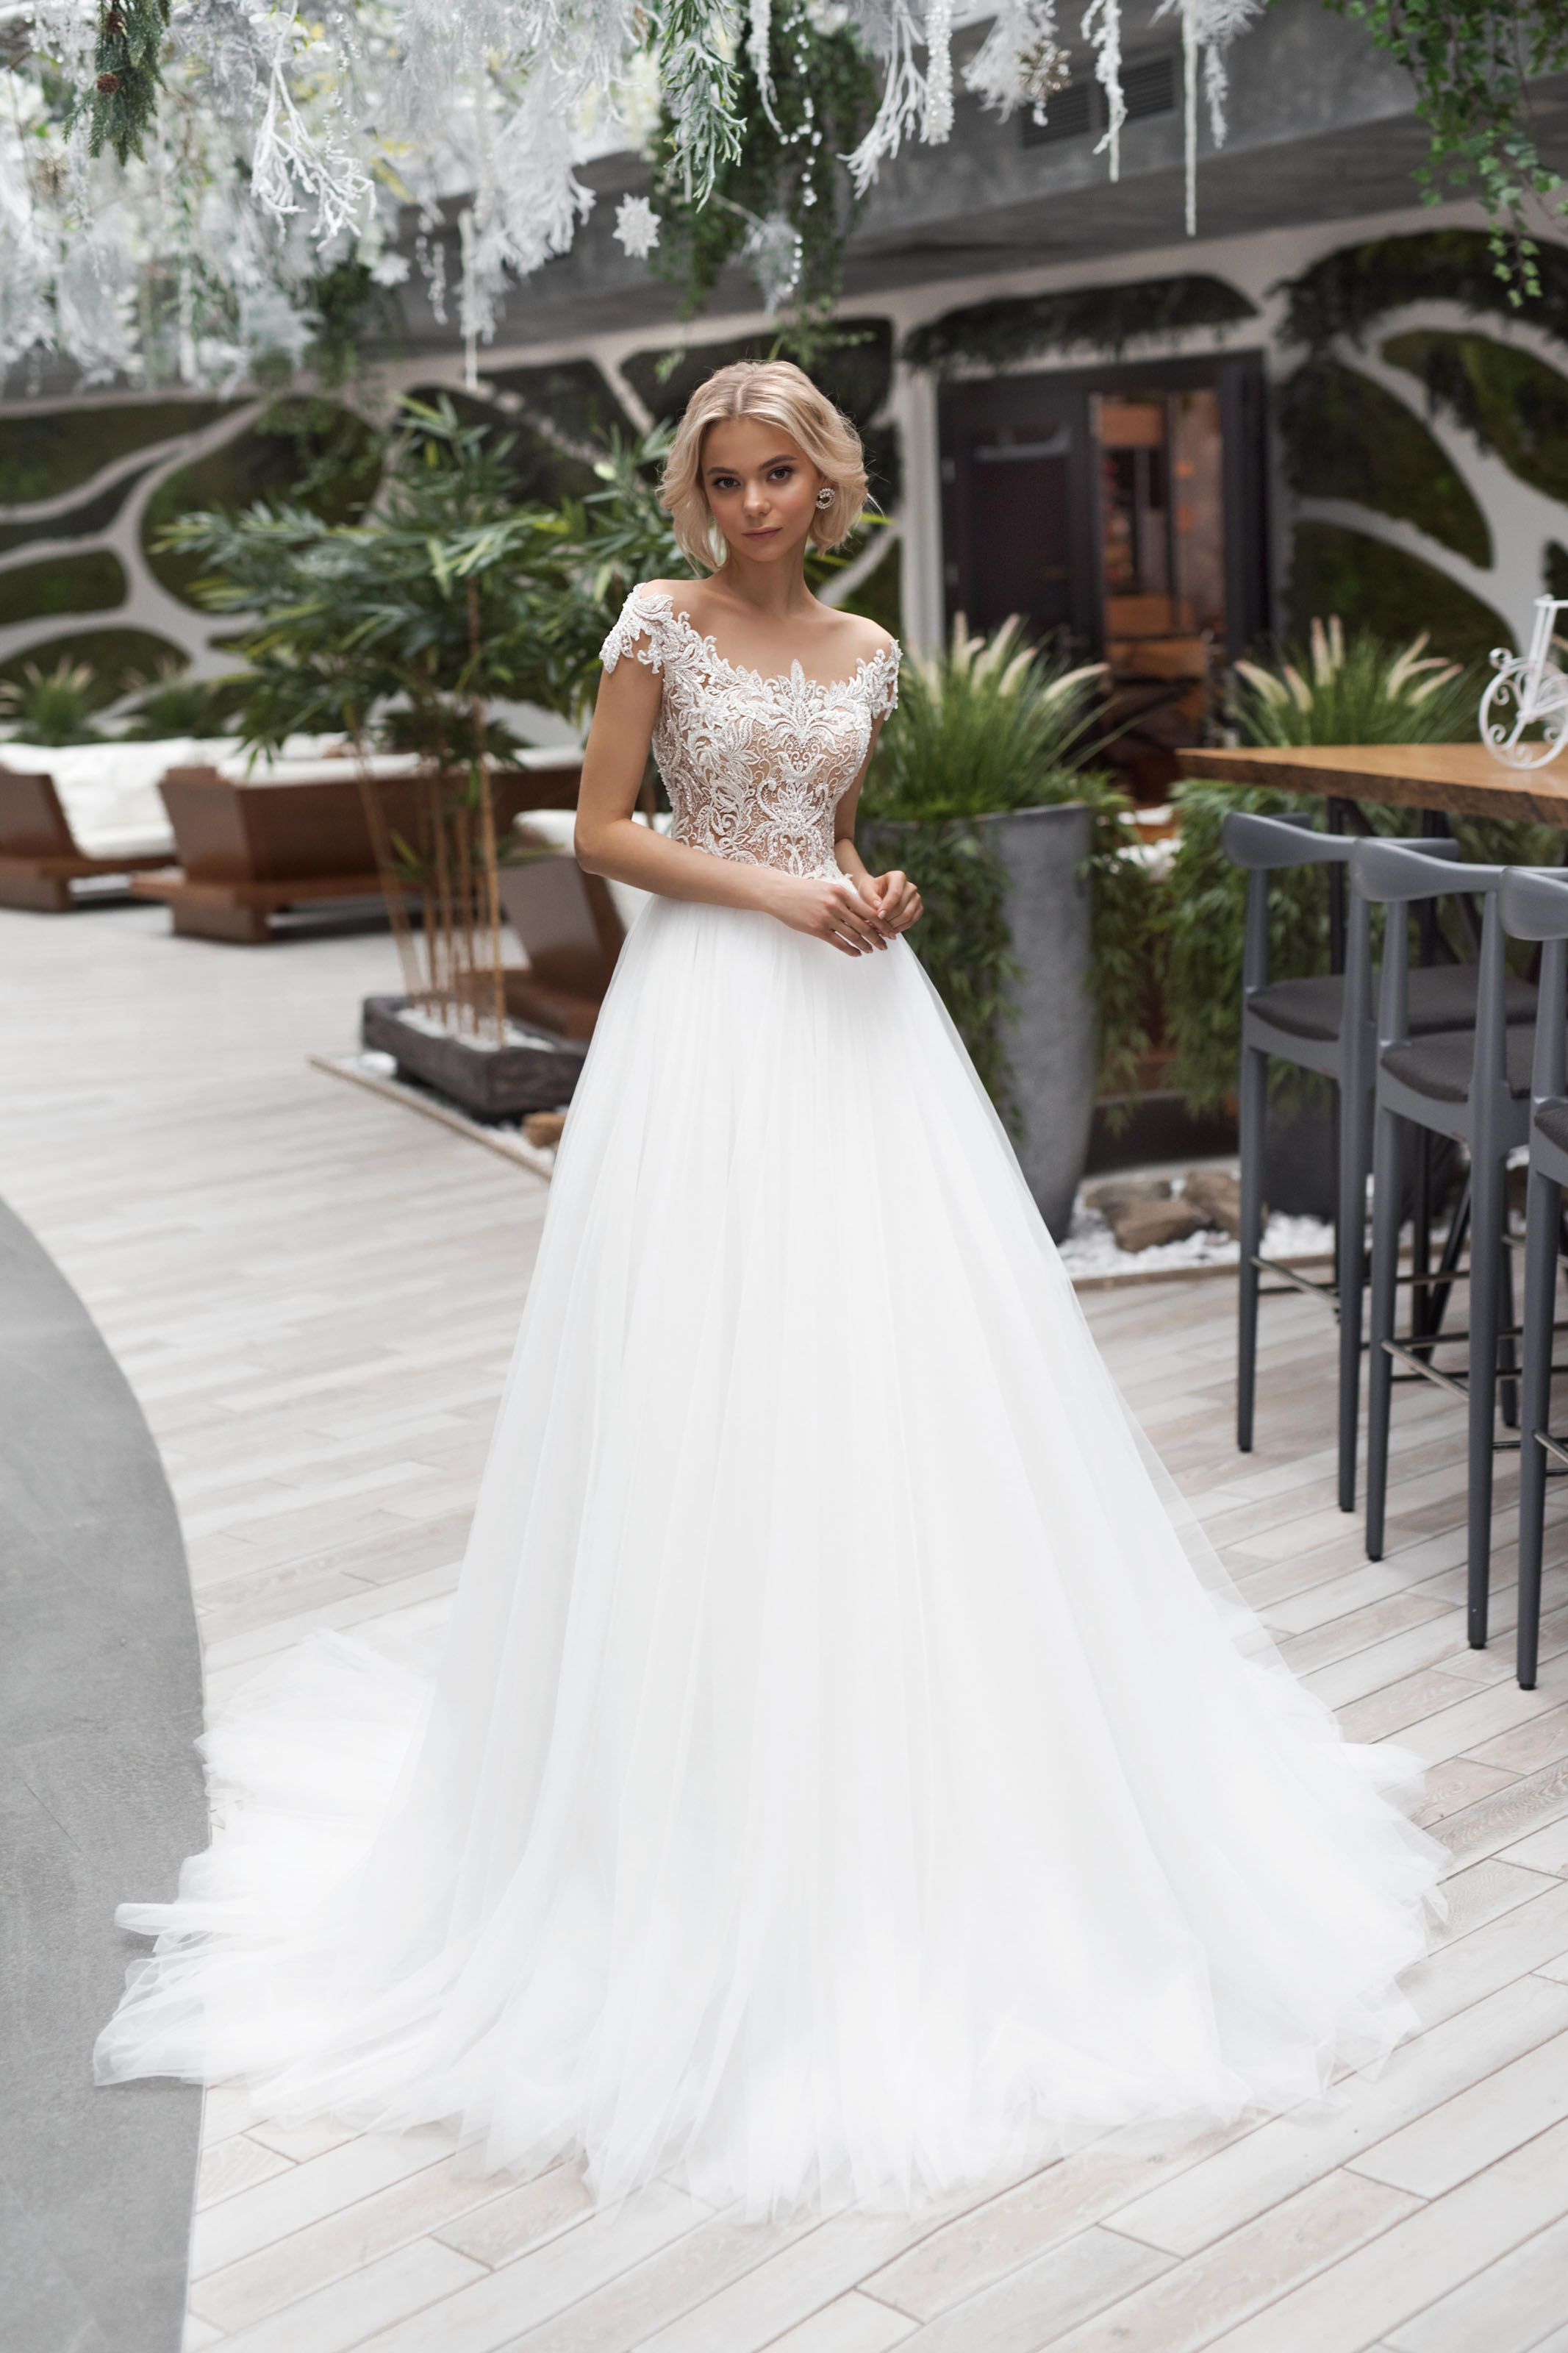 Wedding Gown Strekoza Sinuosa Luxx Nova Wedding Dresses Online Wedding Dress Sparkle Wedding Dress [ 3200 x 2133 Pixel ]